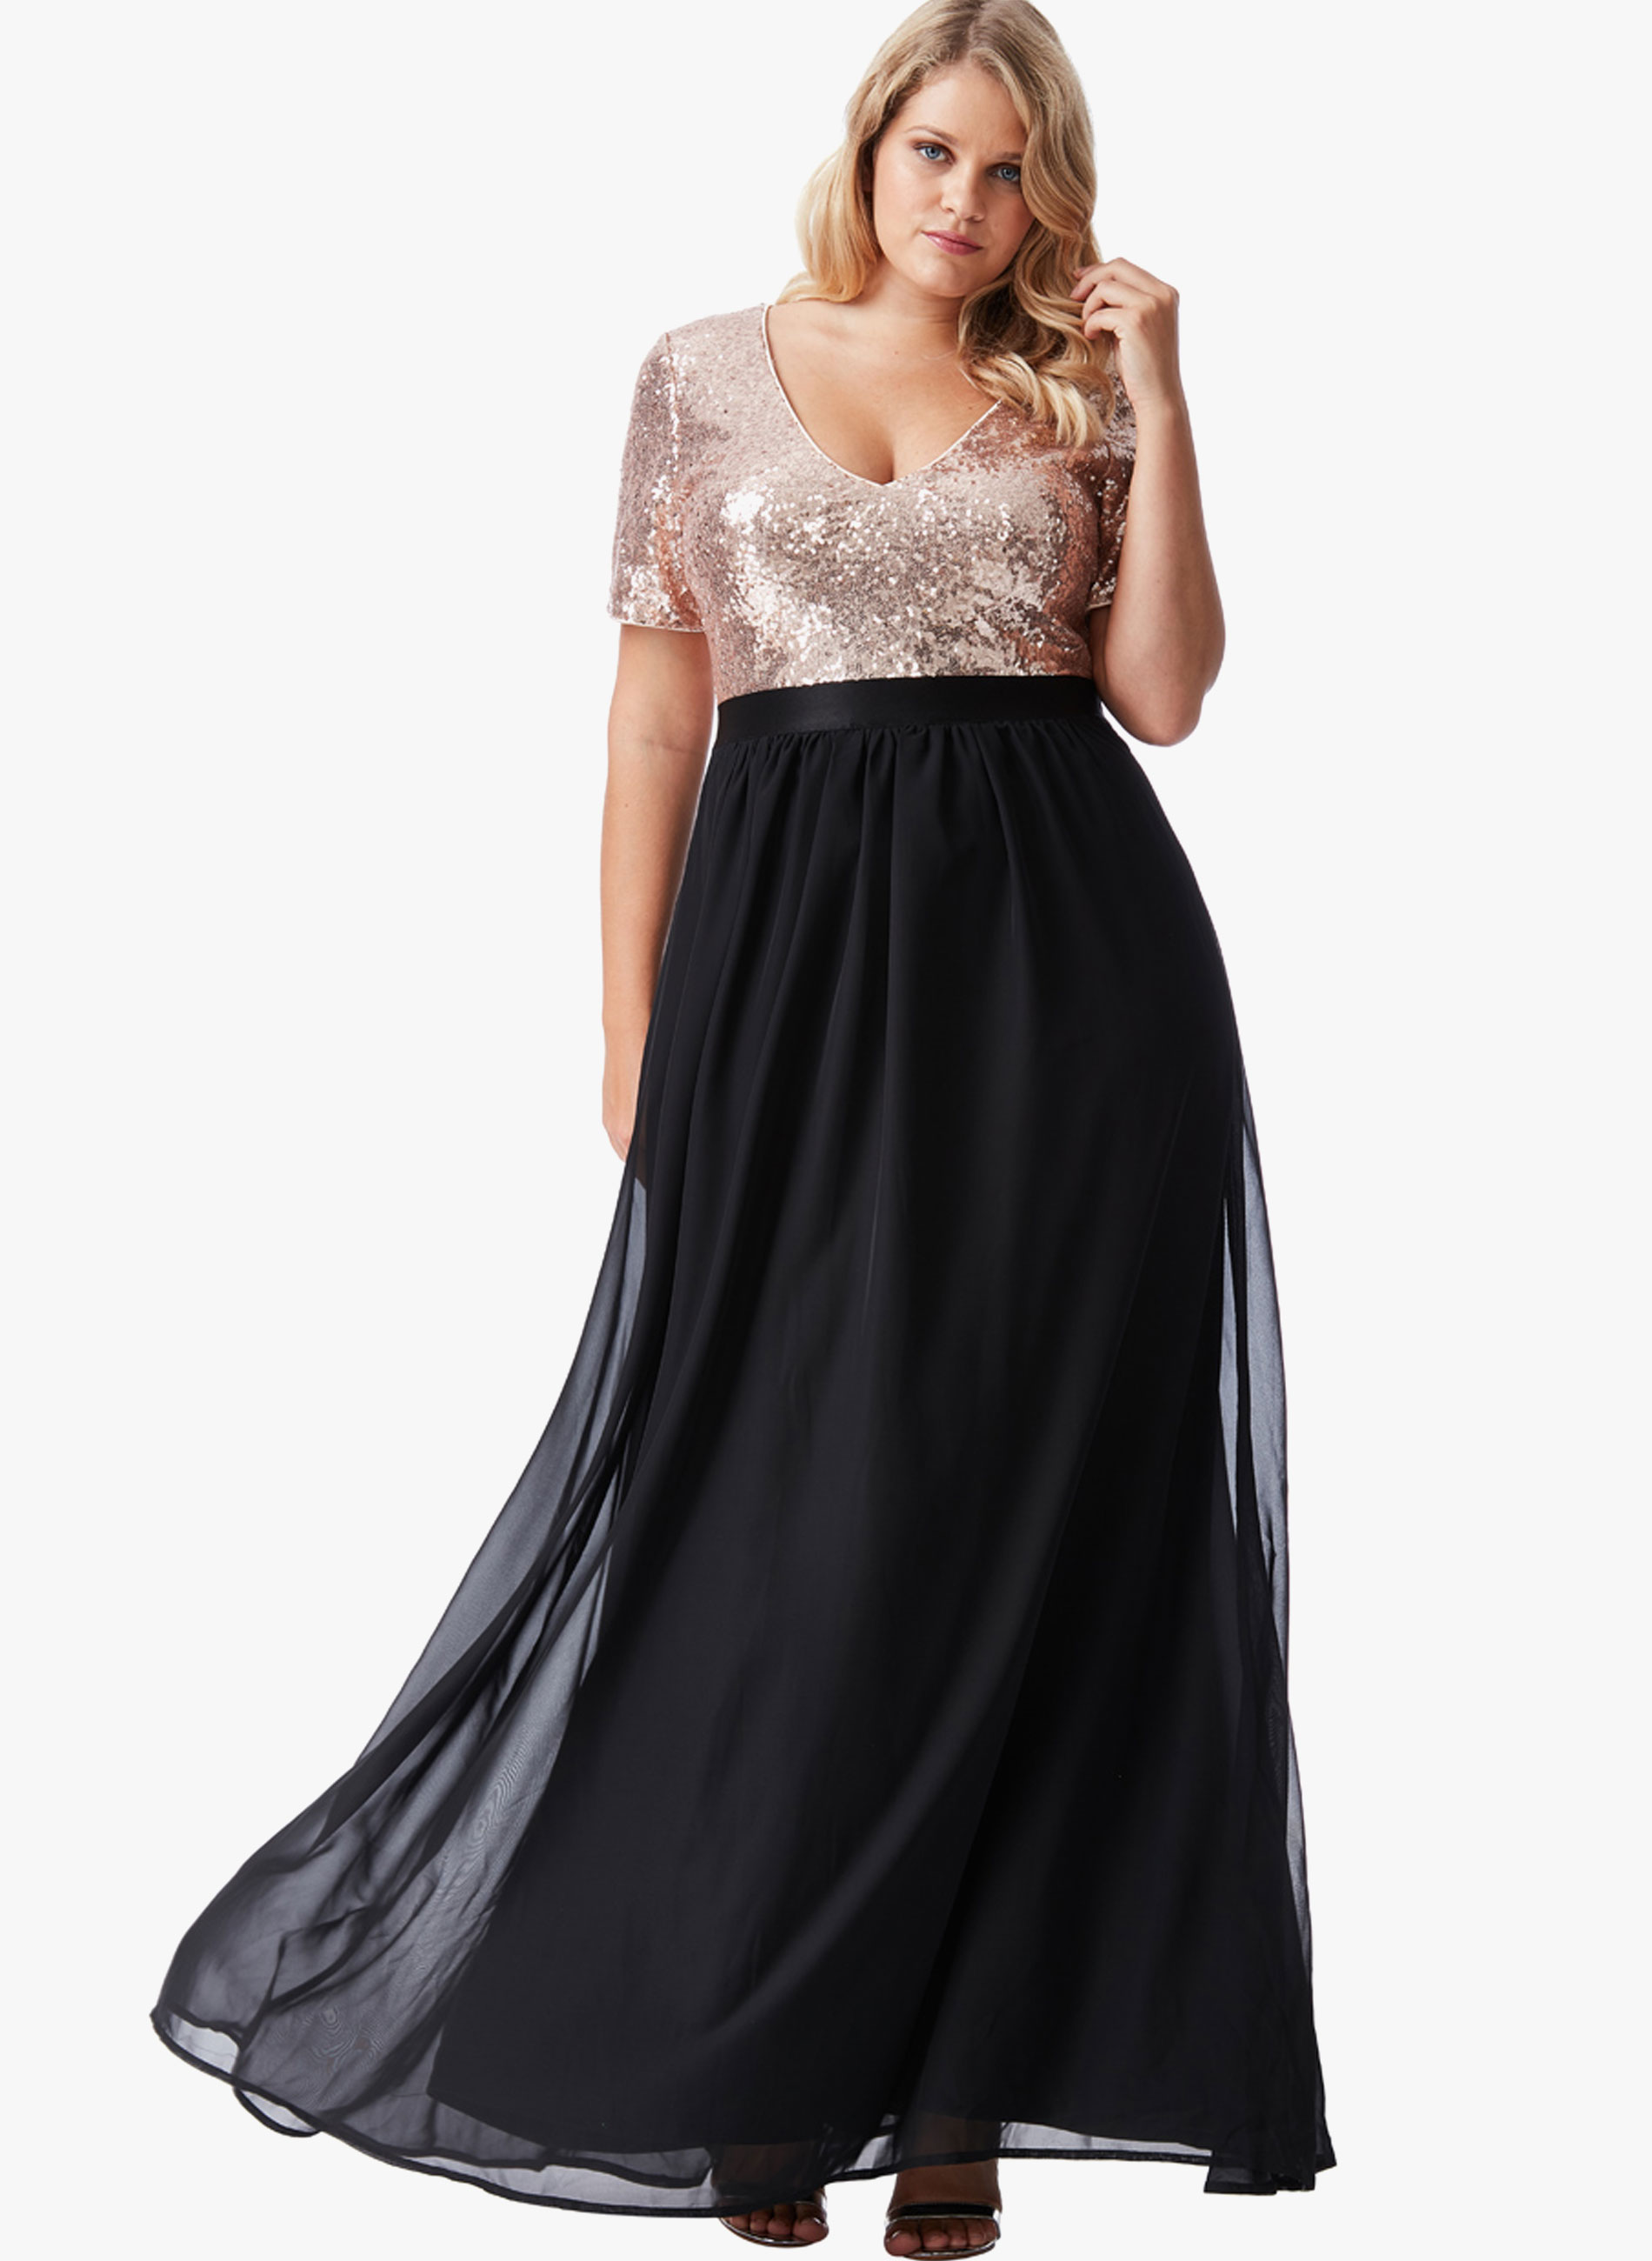 bb599222a81f ΜΕΓΑΛΑ ΜΕΓΕΘΗ ΦΟΡΕΜΑΤΑ :: Φόρεμα Maxi με Χρυσή Παγιέτα - Μόδα σε ...